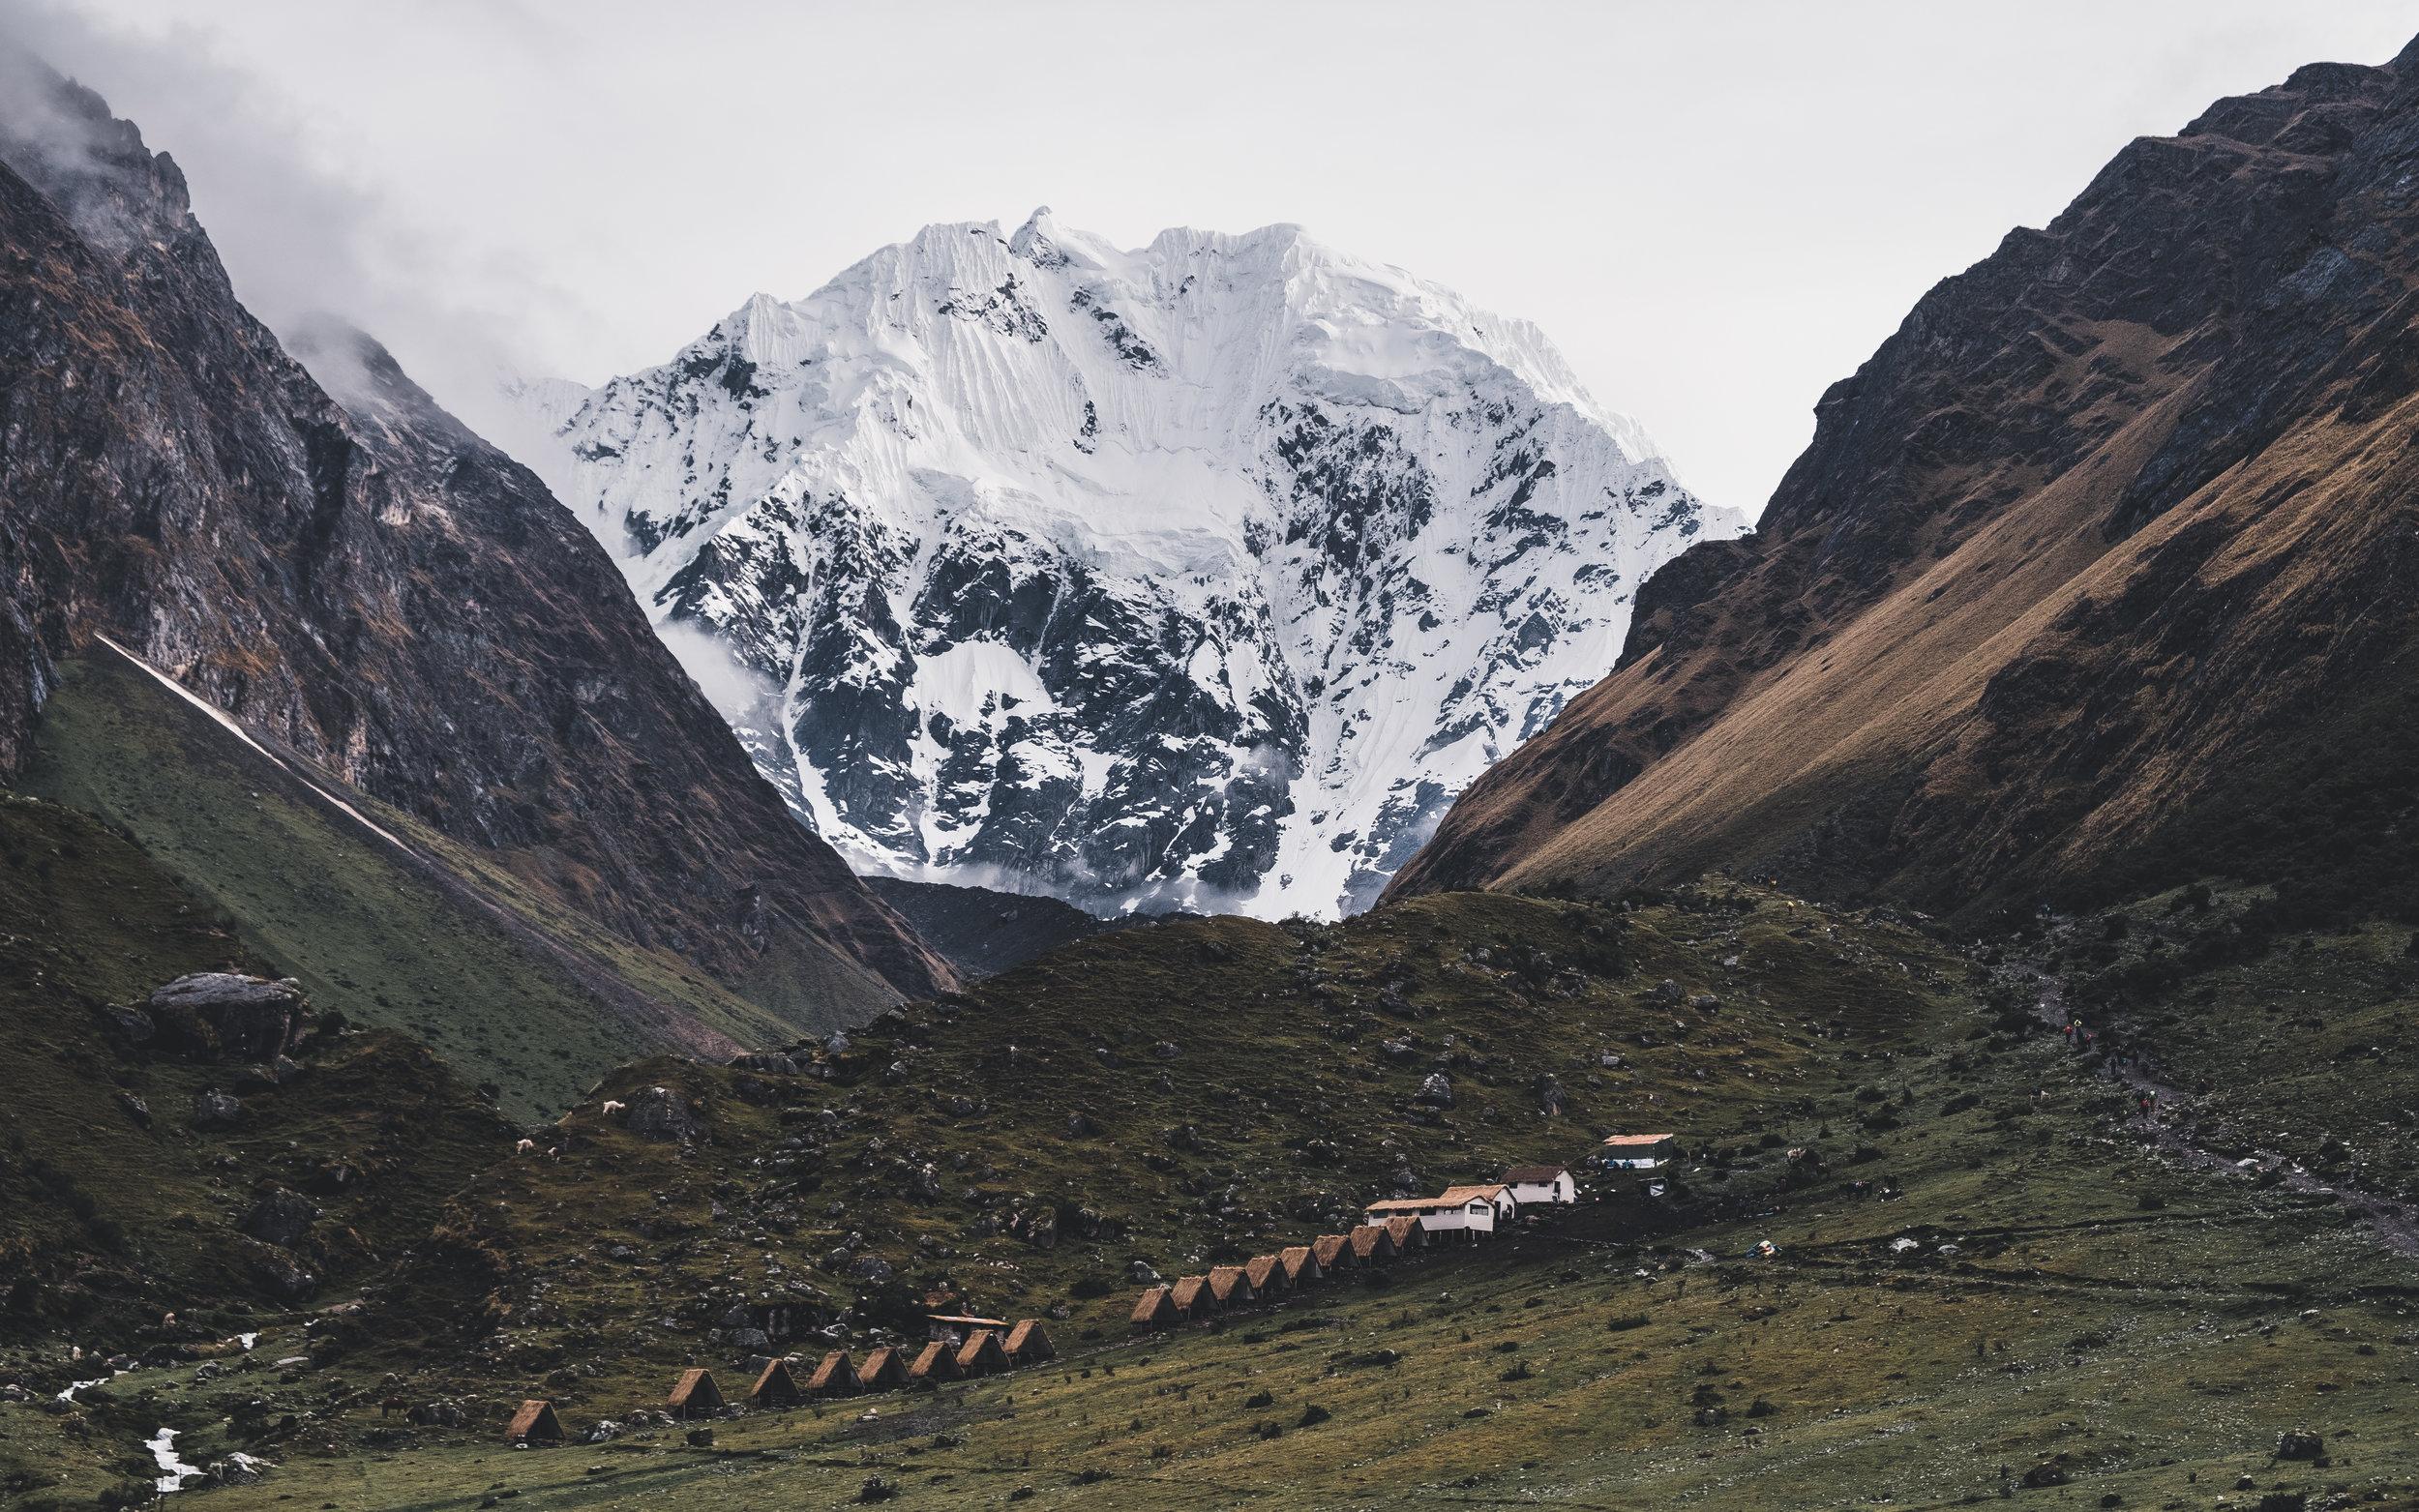 Nevado Salkantay 6.271 m | Cordillera Vilcabamba